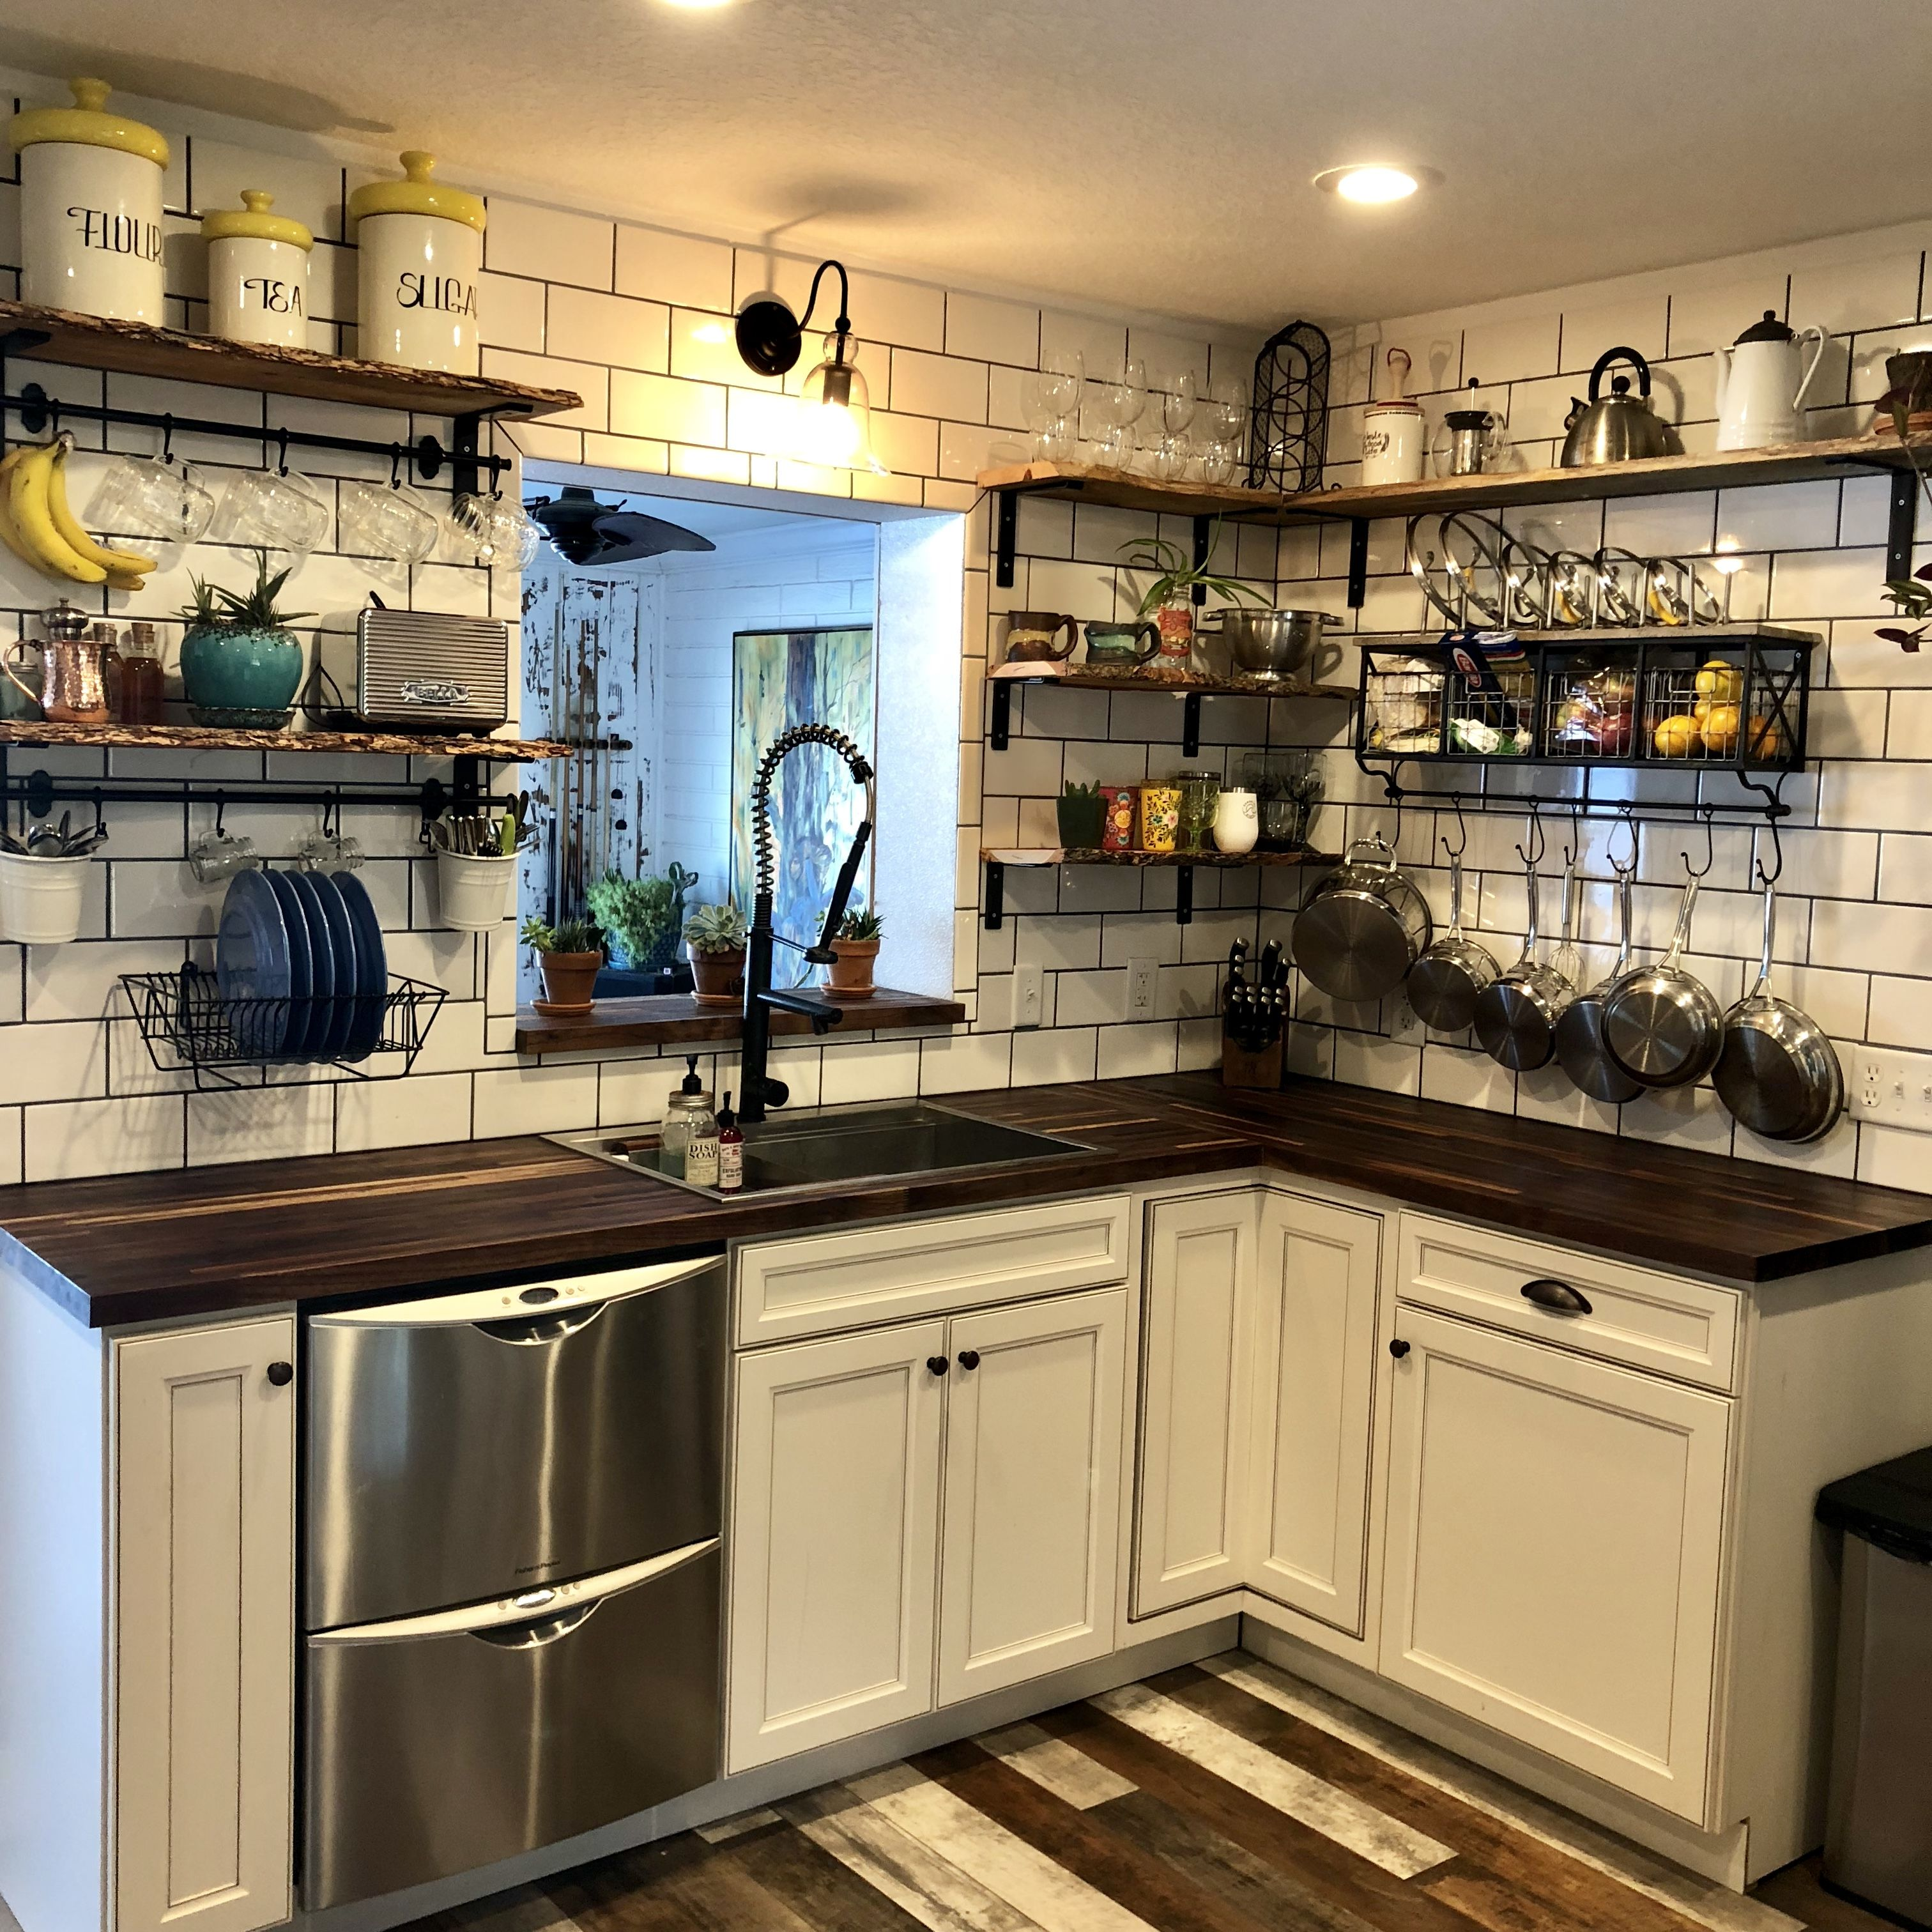 Farmhouse style kitchen live edge wood exposed shelves